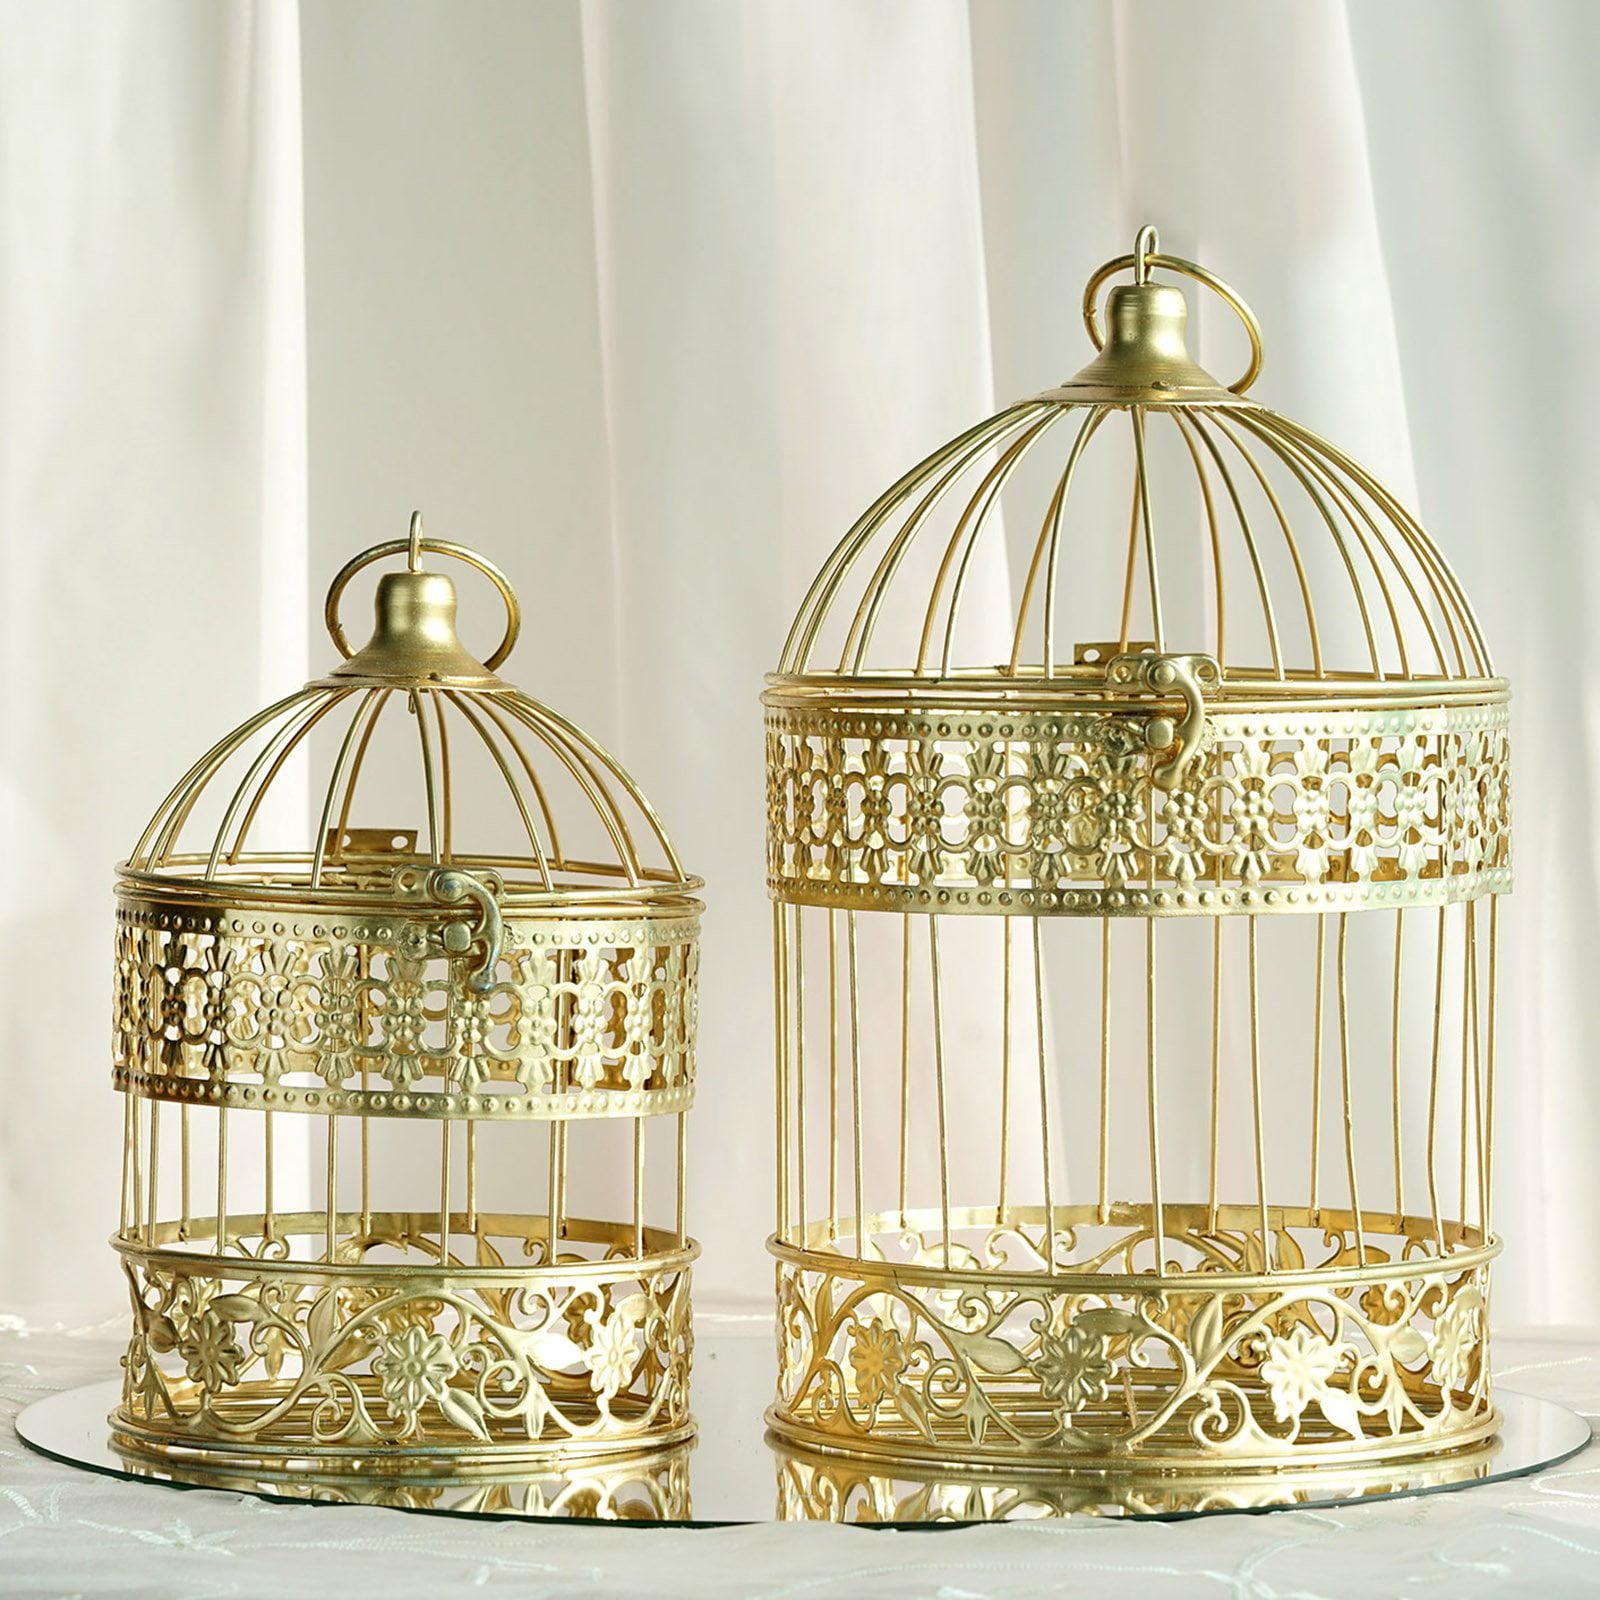 Efavormart 2 Sets Of Large Metallic Gold Bird Cage Wedding Centerpiece Table Party Decor All Occasions 9 13 Tall Walmart Com Walmart Com